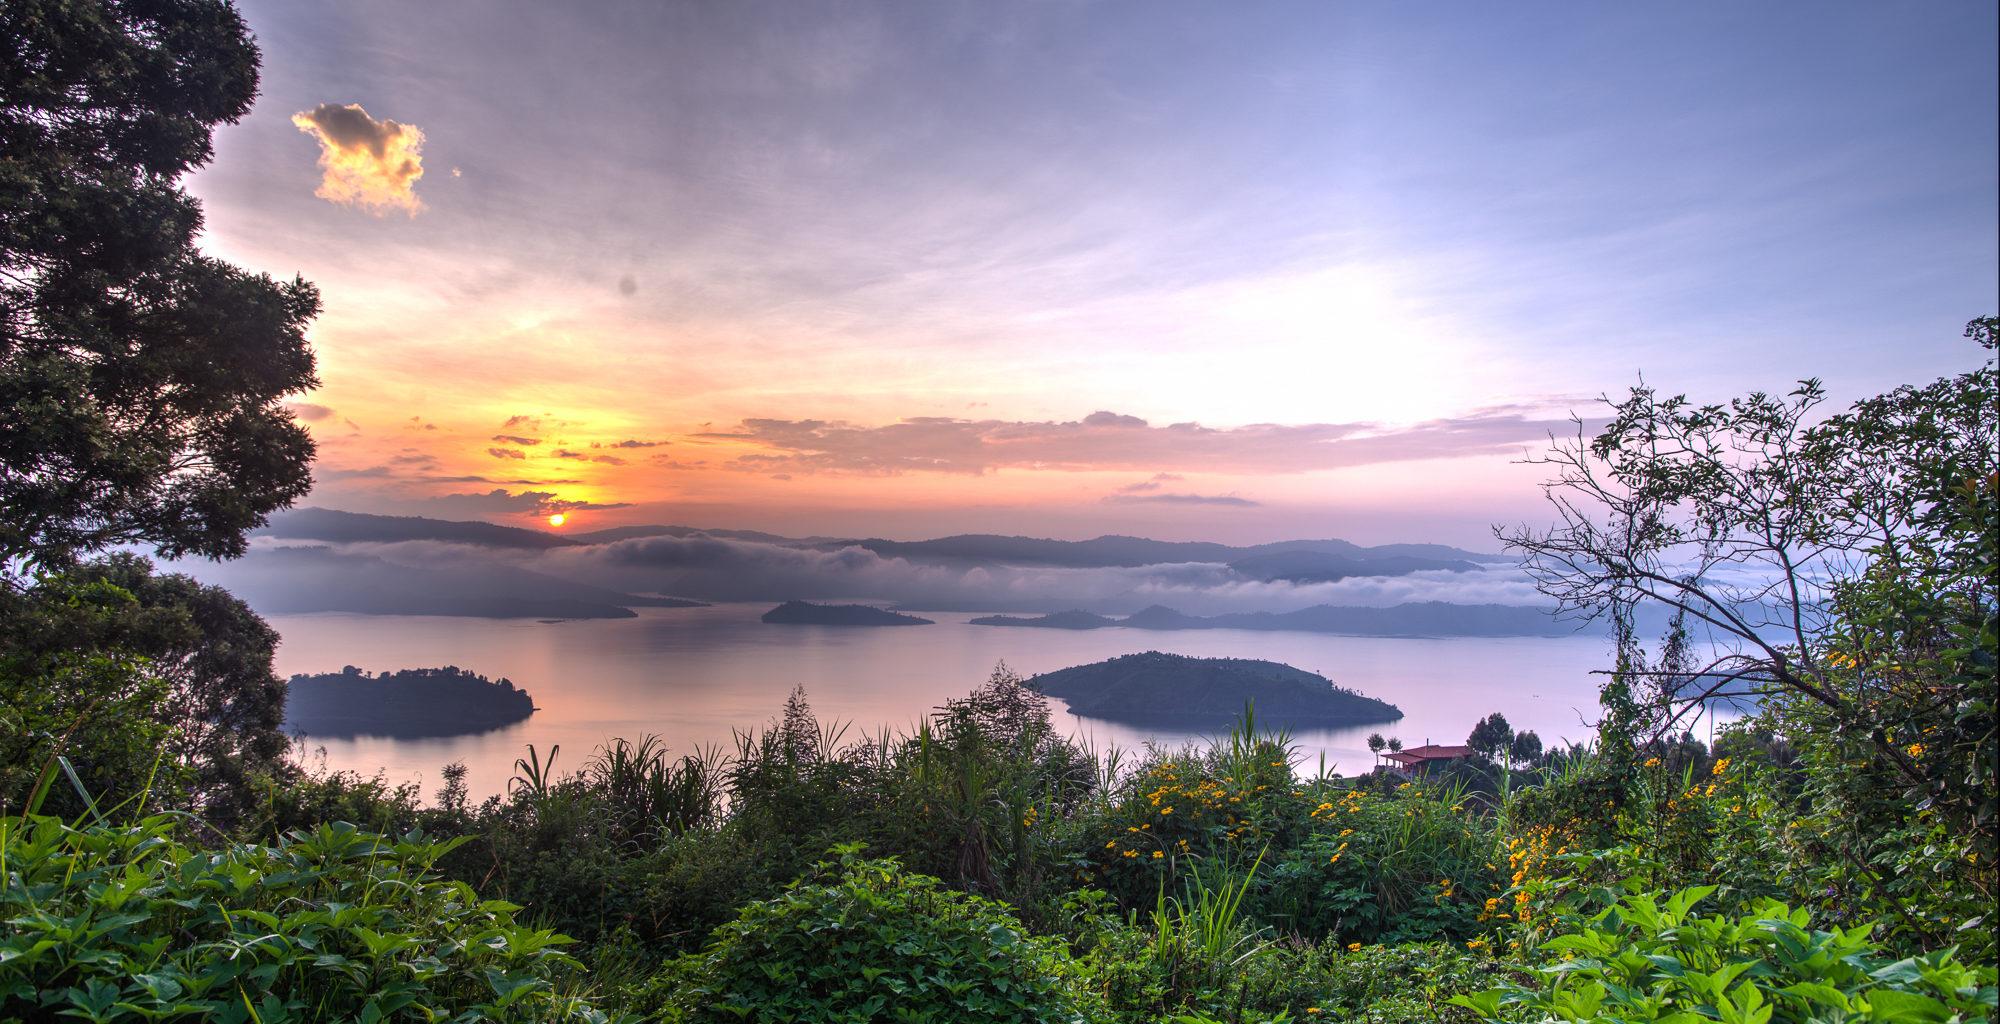 Rwanda-Volcanoes-National-Park-Sunset